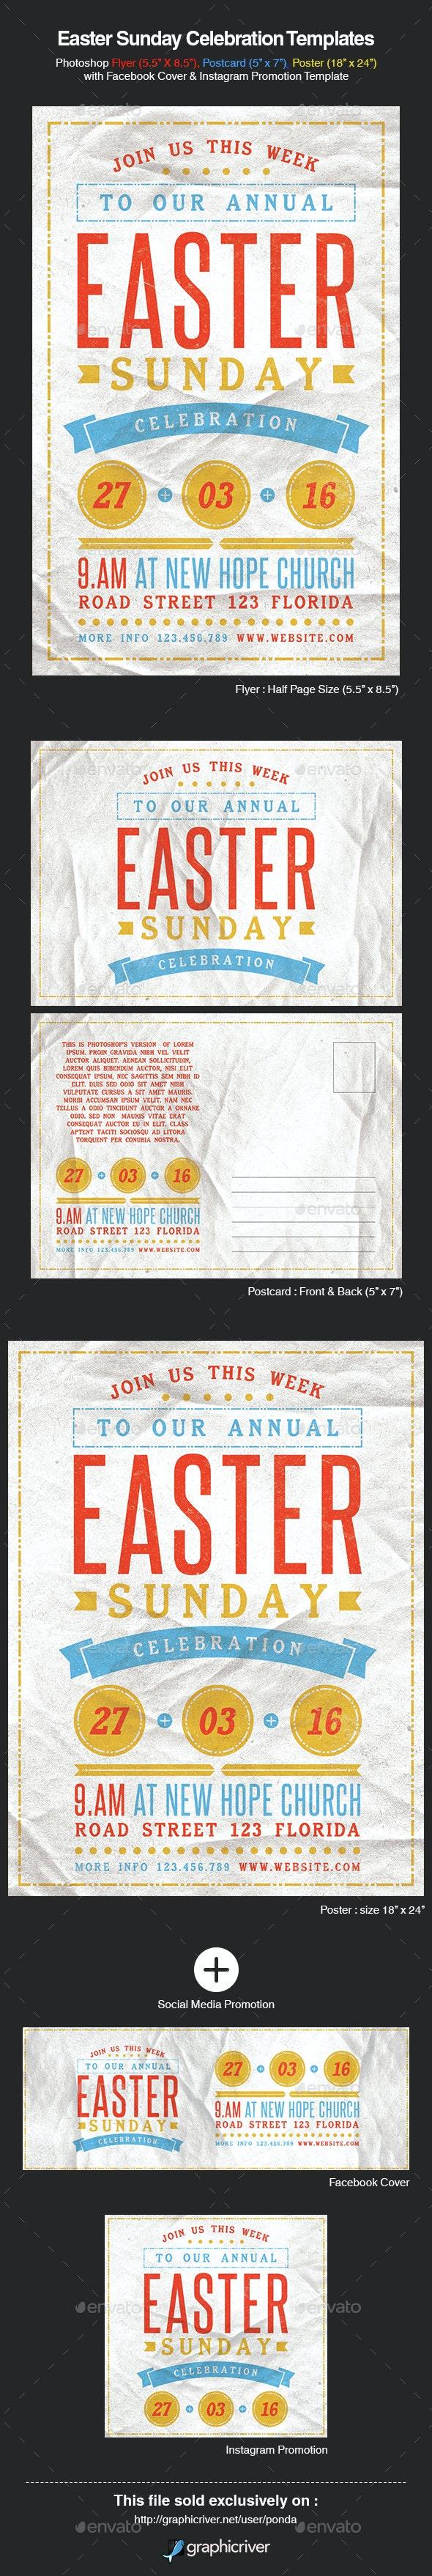 Easter Sunday Celebration Templates - Church Flyers